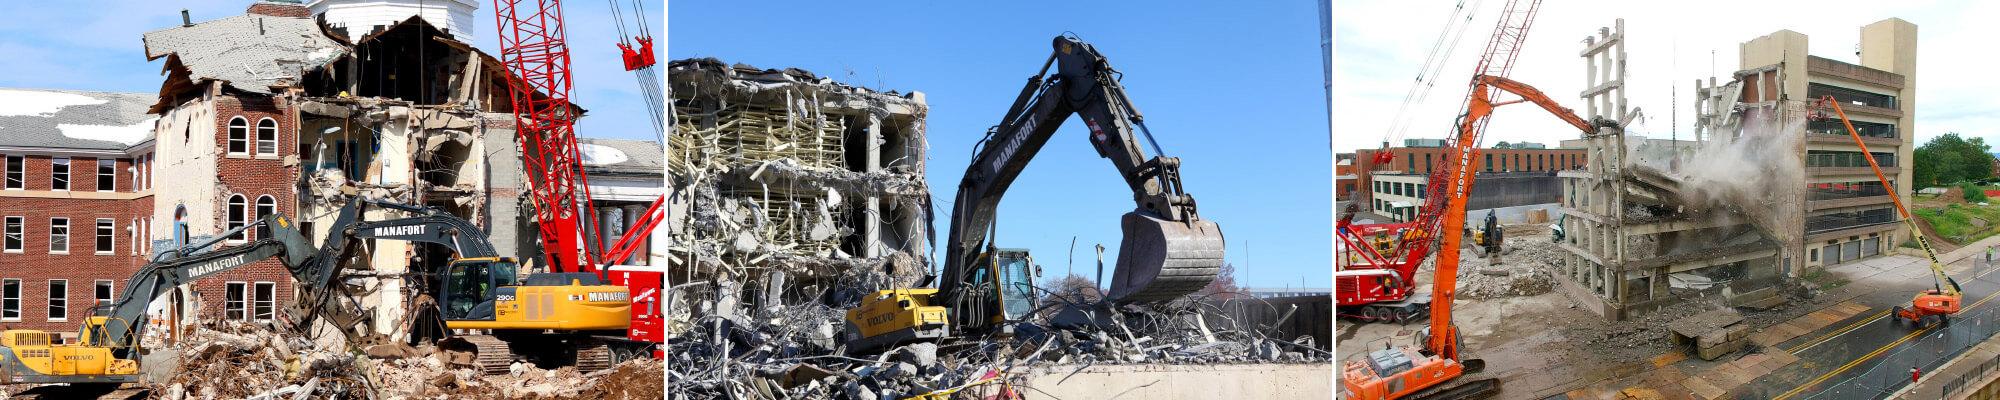 Industrial Demolition Company, Hazardous Remediation, Hazardous Abatement